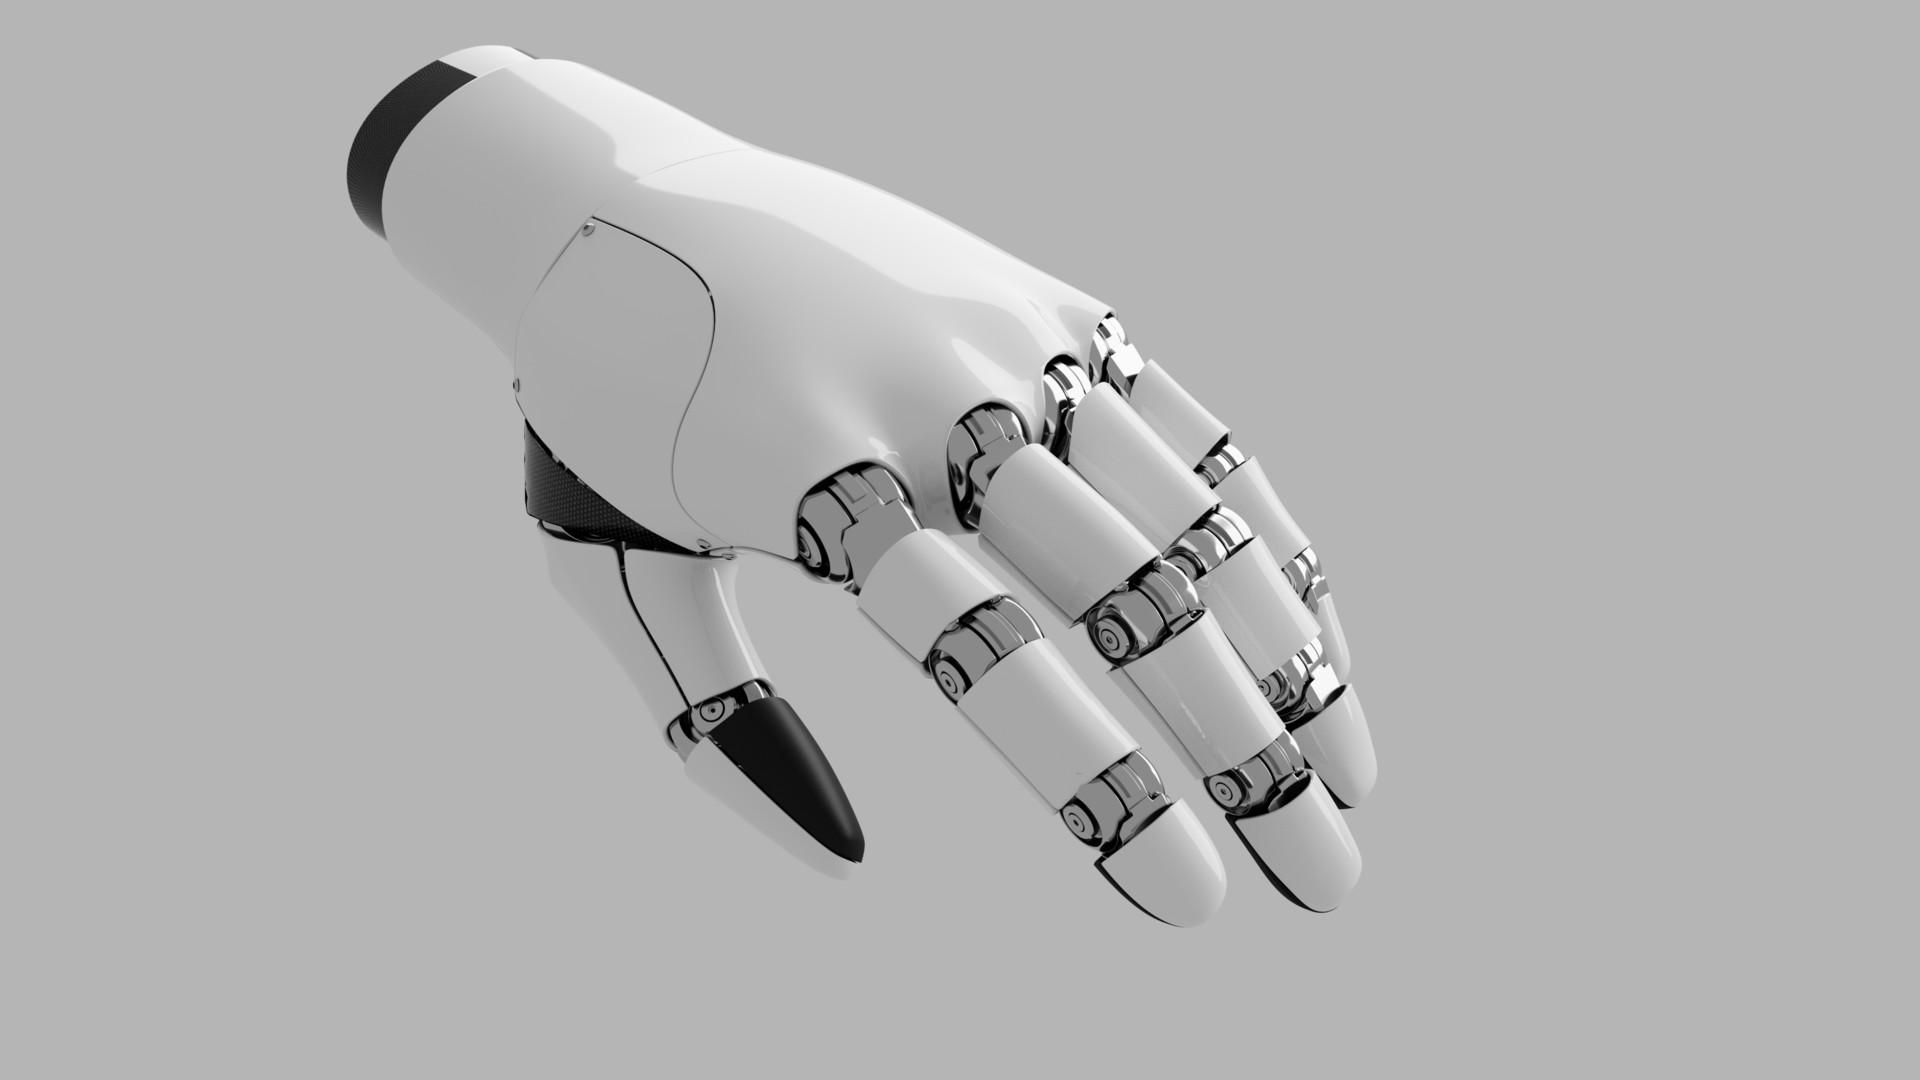 Prashan s robotic hand